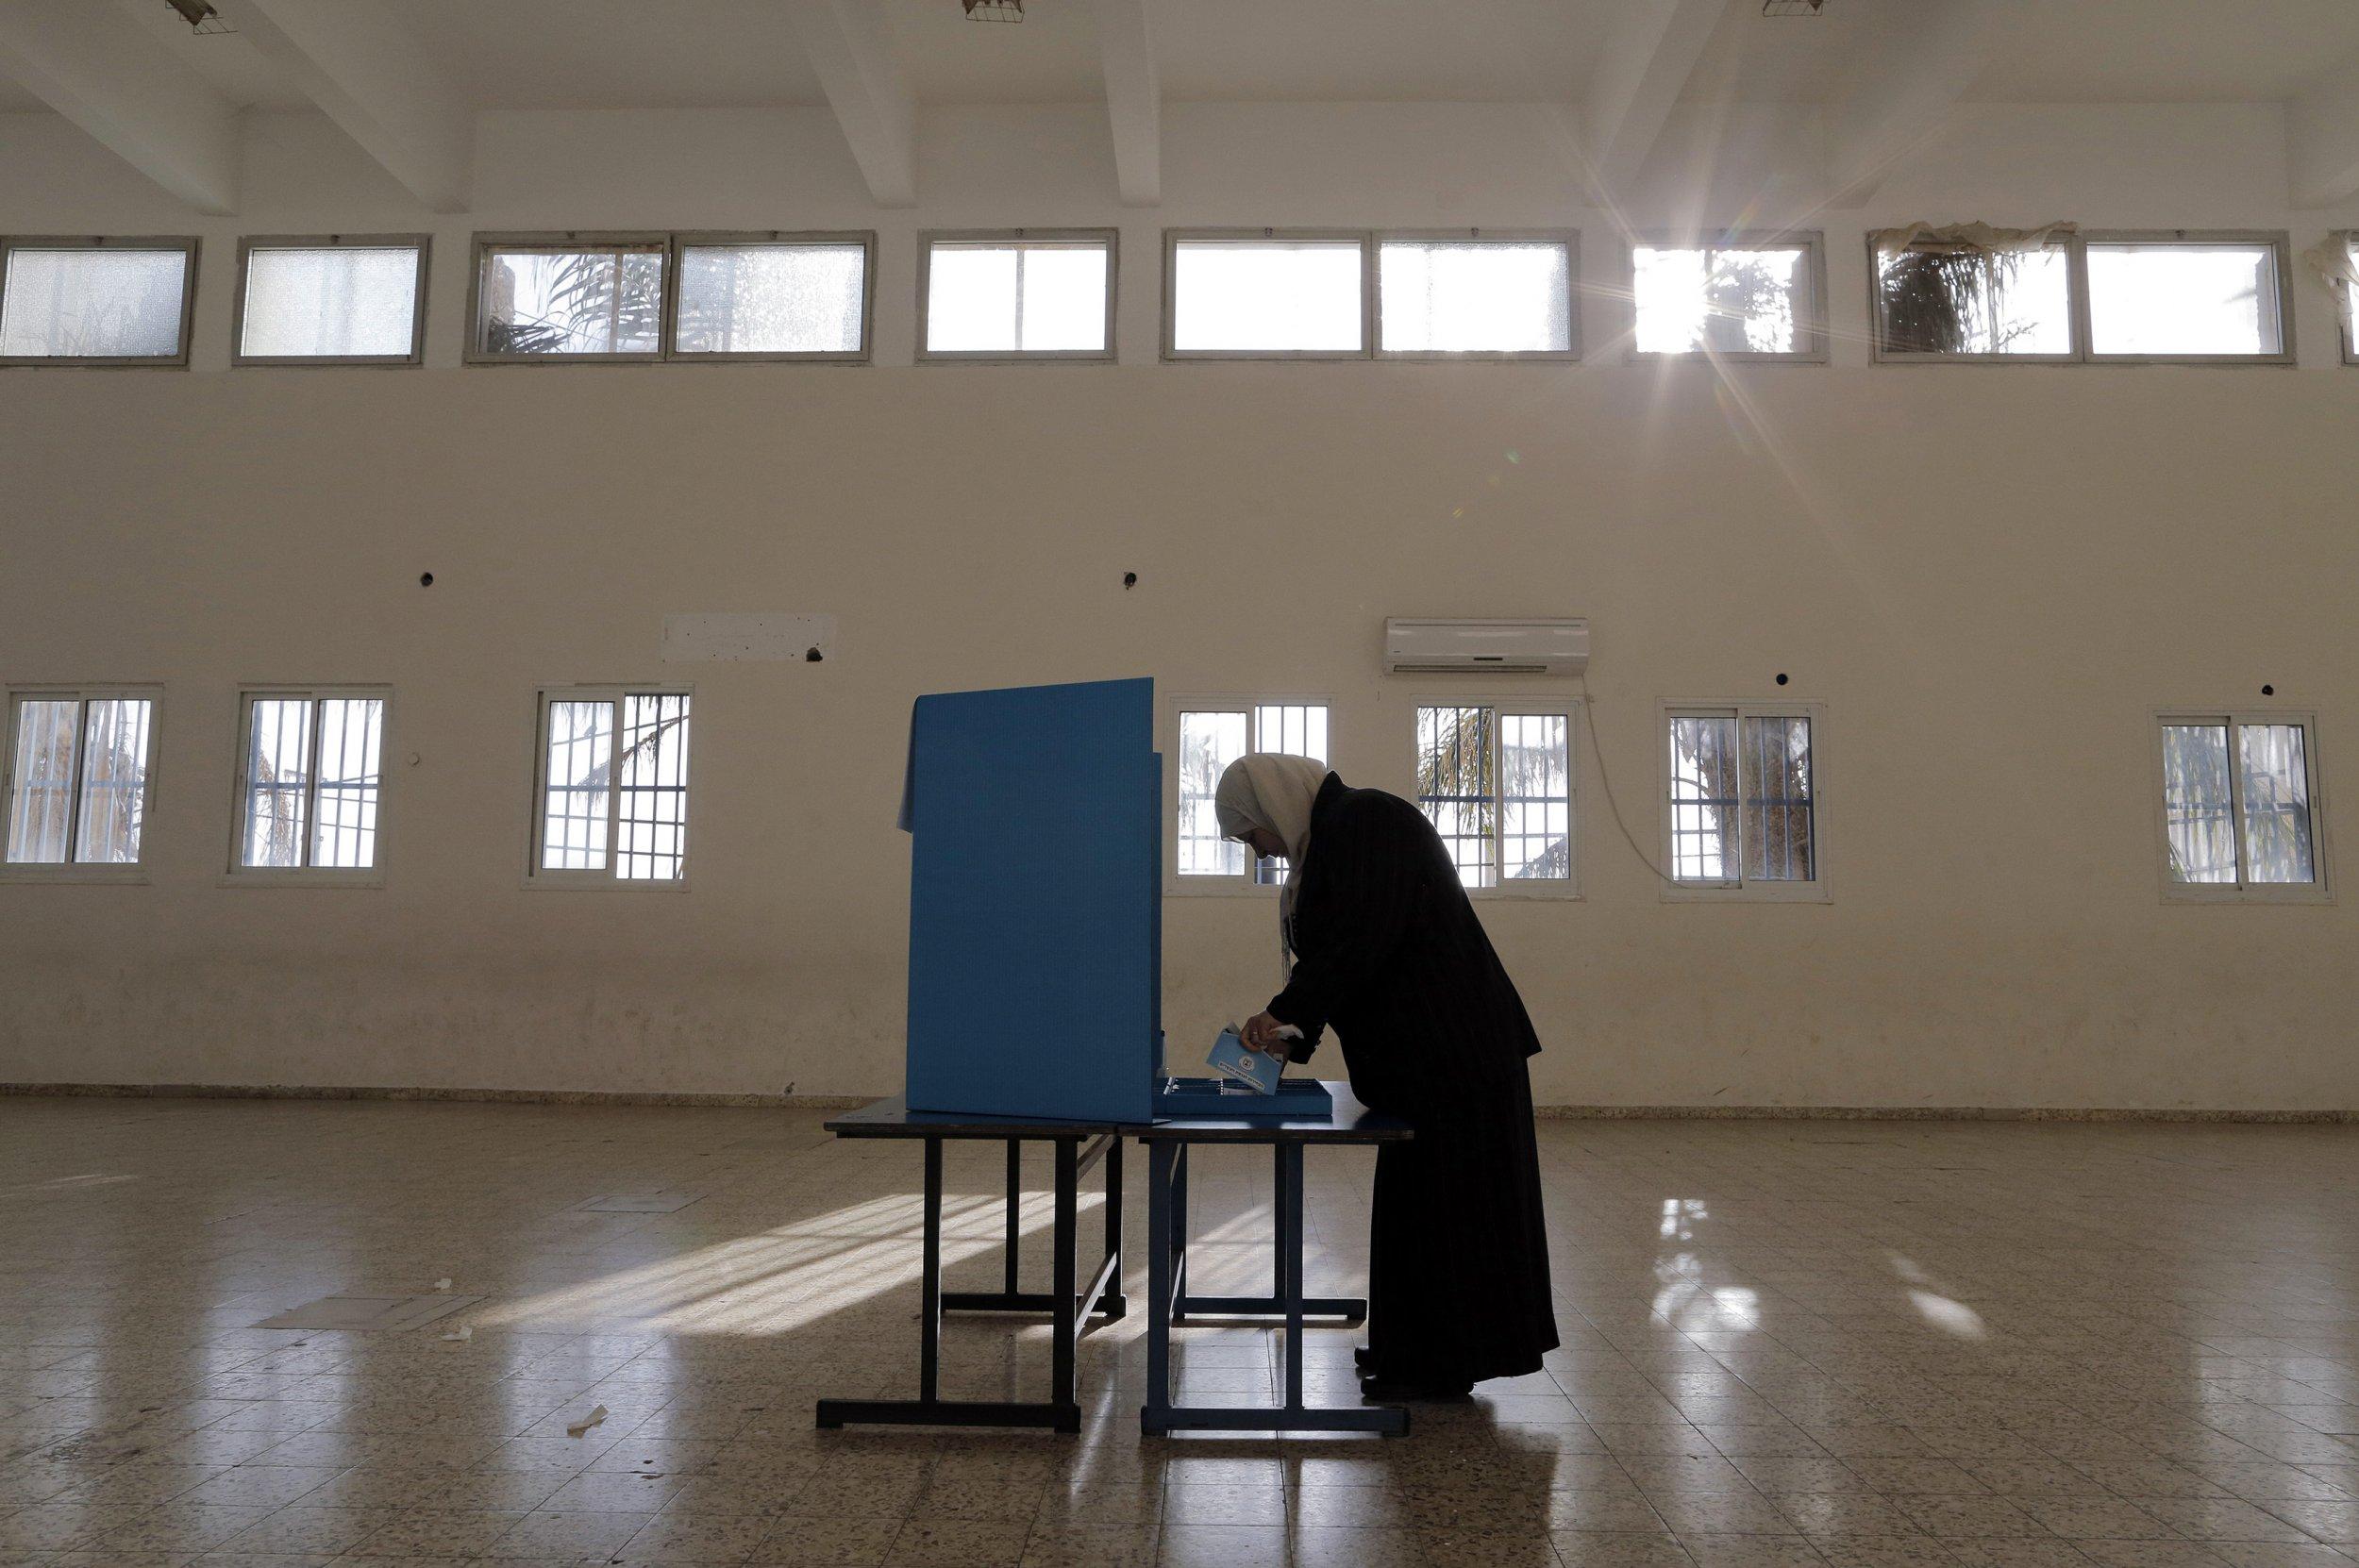 3-17-15 Israel Elections 9